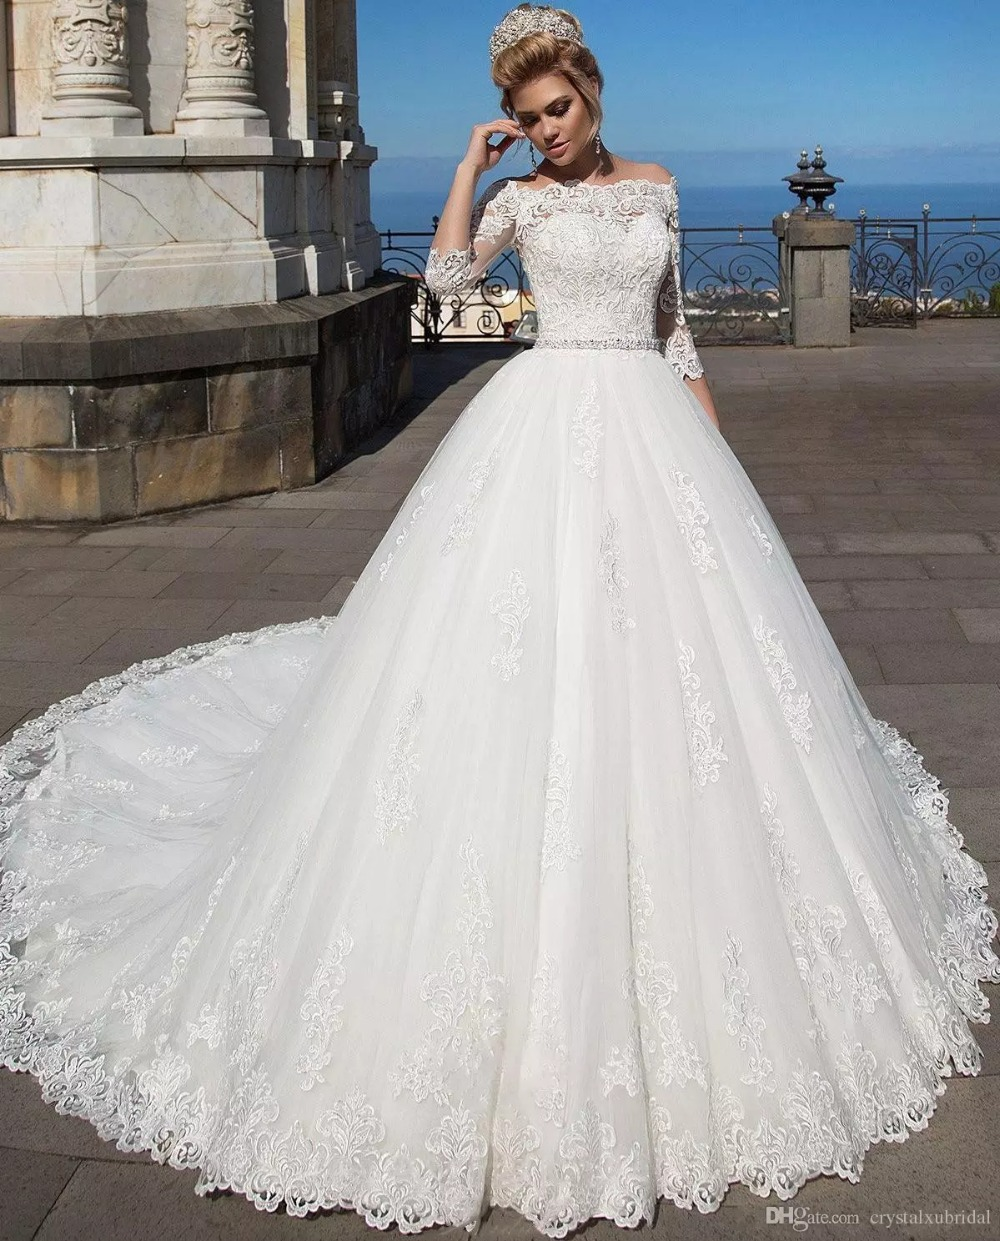 2018 New Arabic 3/4 Long Sleeves Ball Gown Wedding Dresses